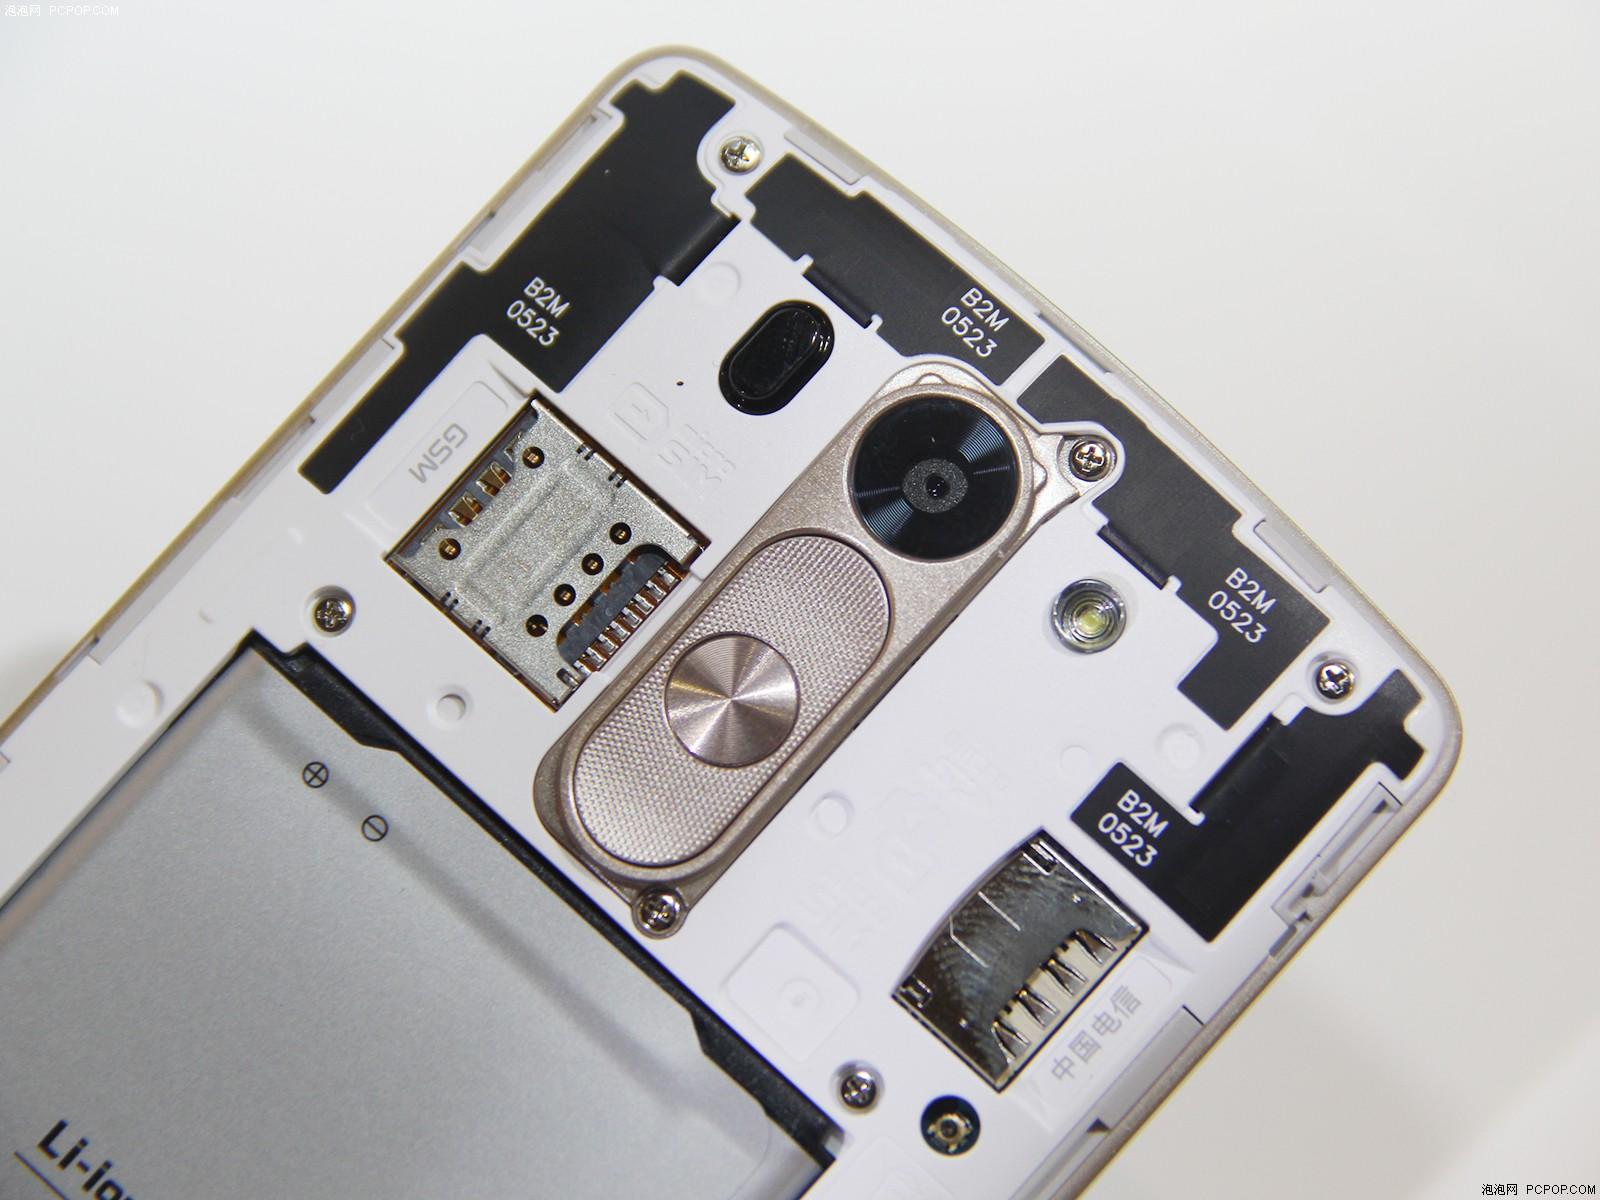 LG G3 Mini leaks under the LG G3 Beat moniker | AIVAnet